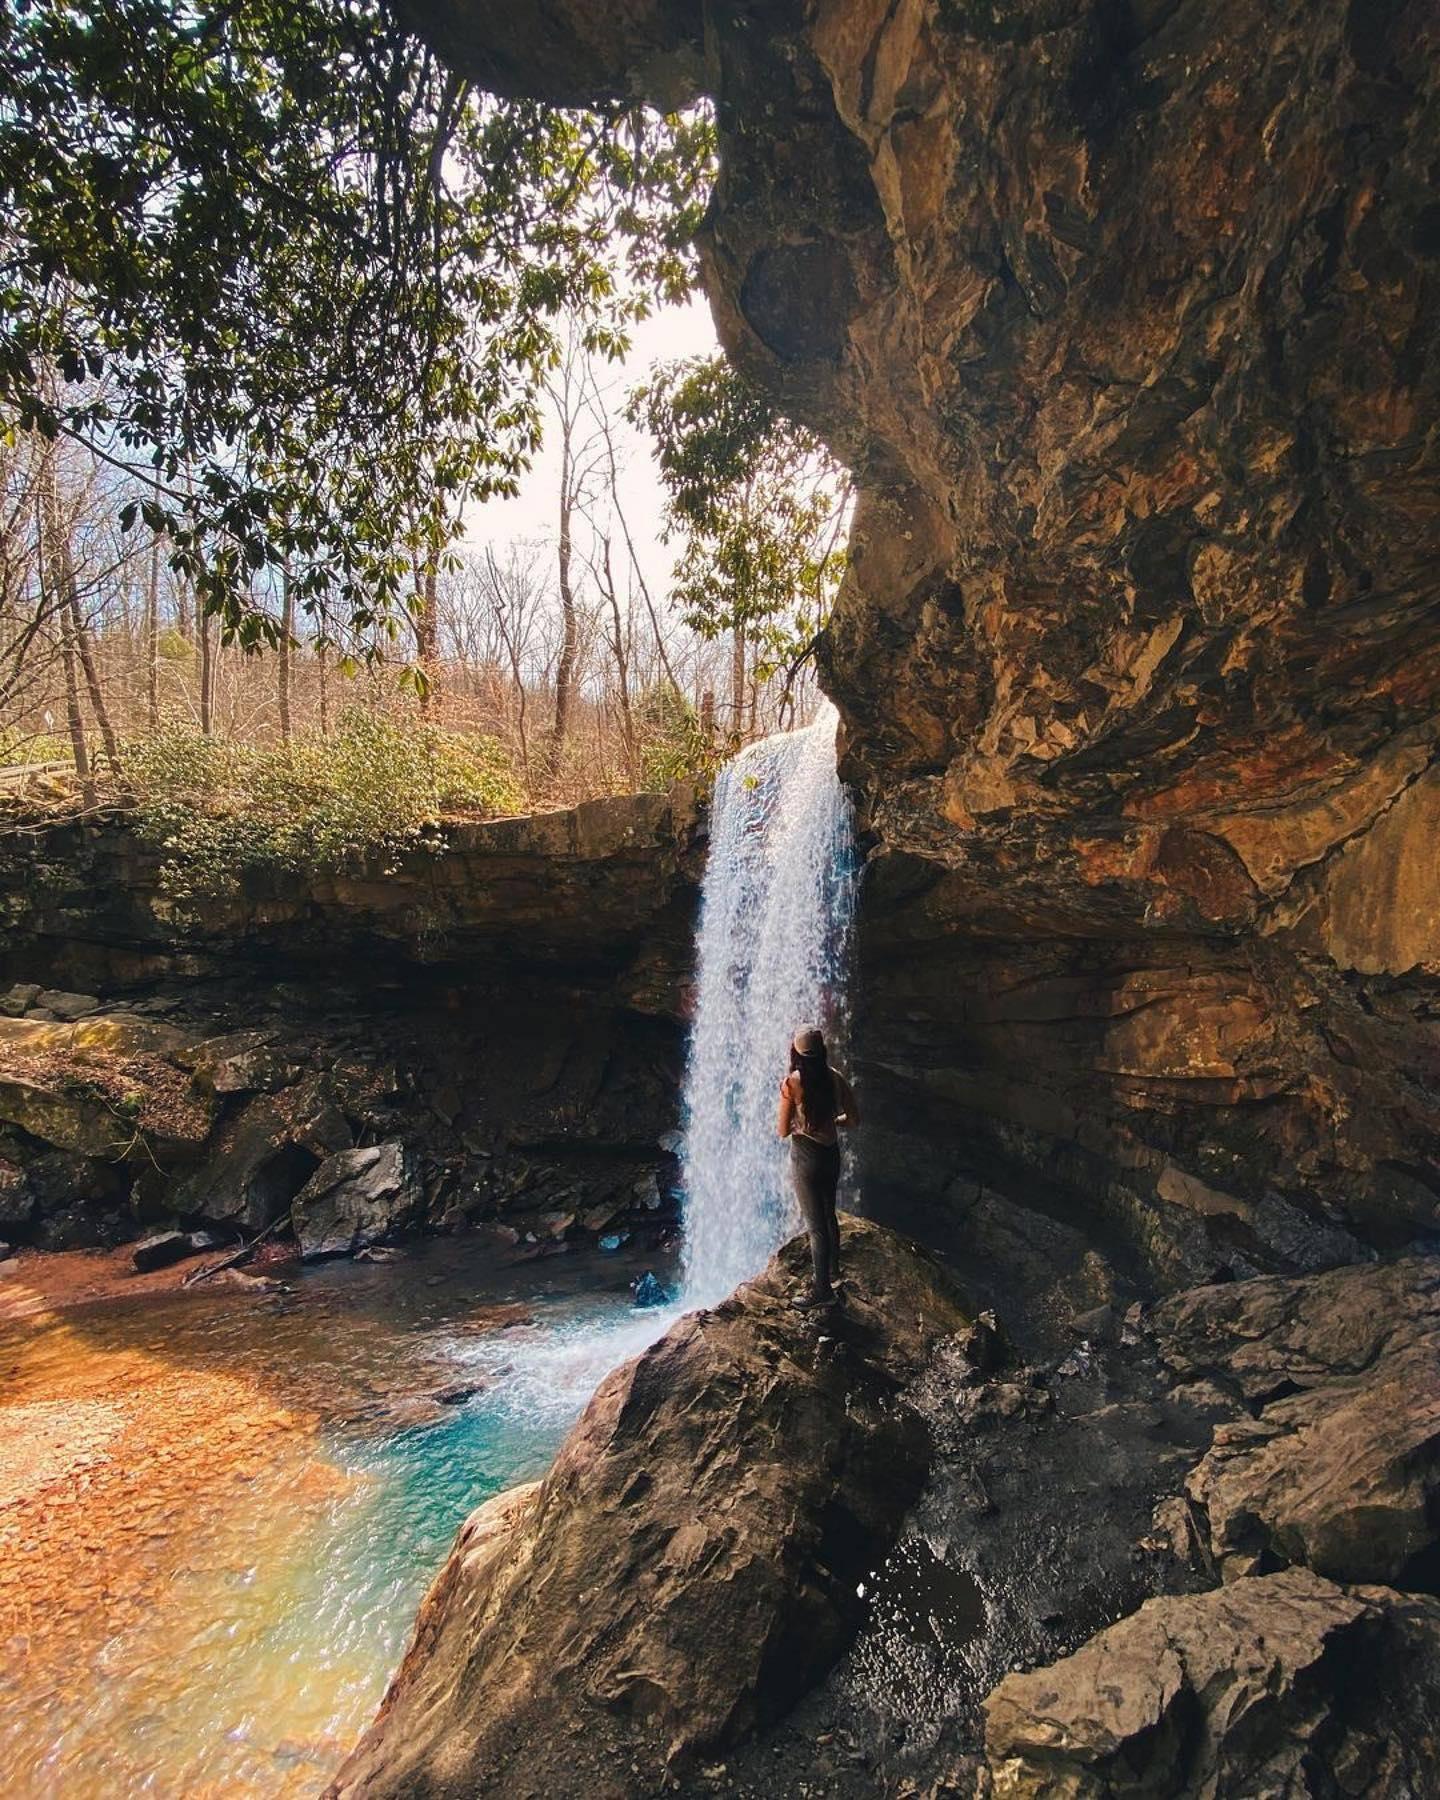 Cucumber Falls waterfall in Ohiopyle State Park Ohiopyle, PA